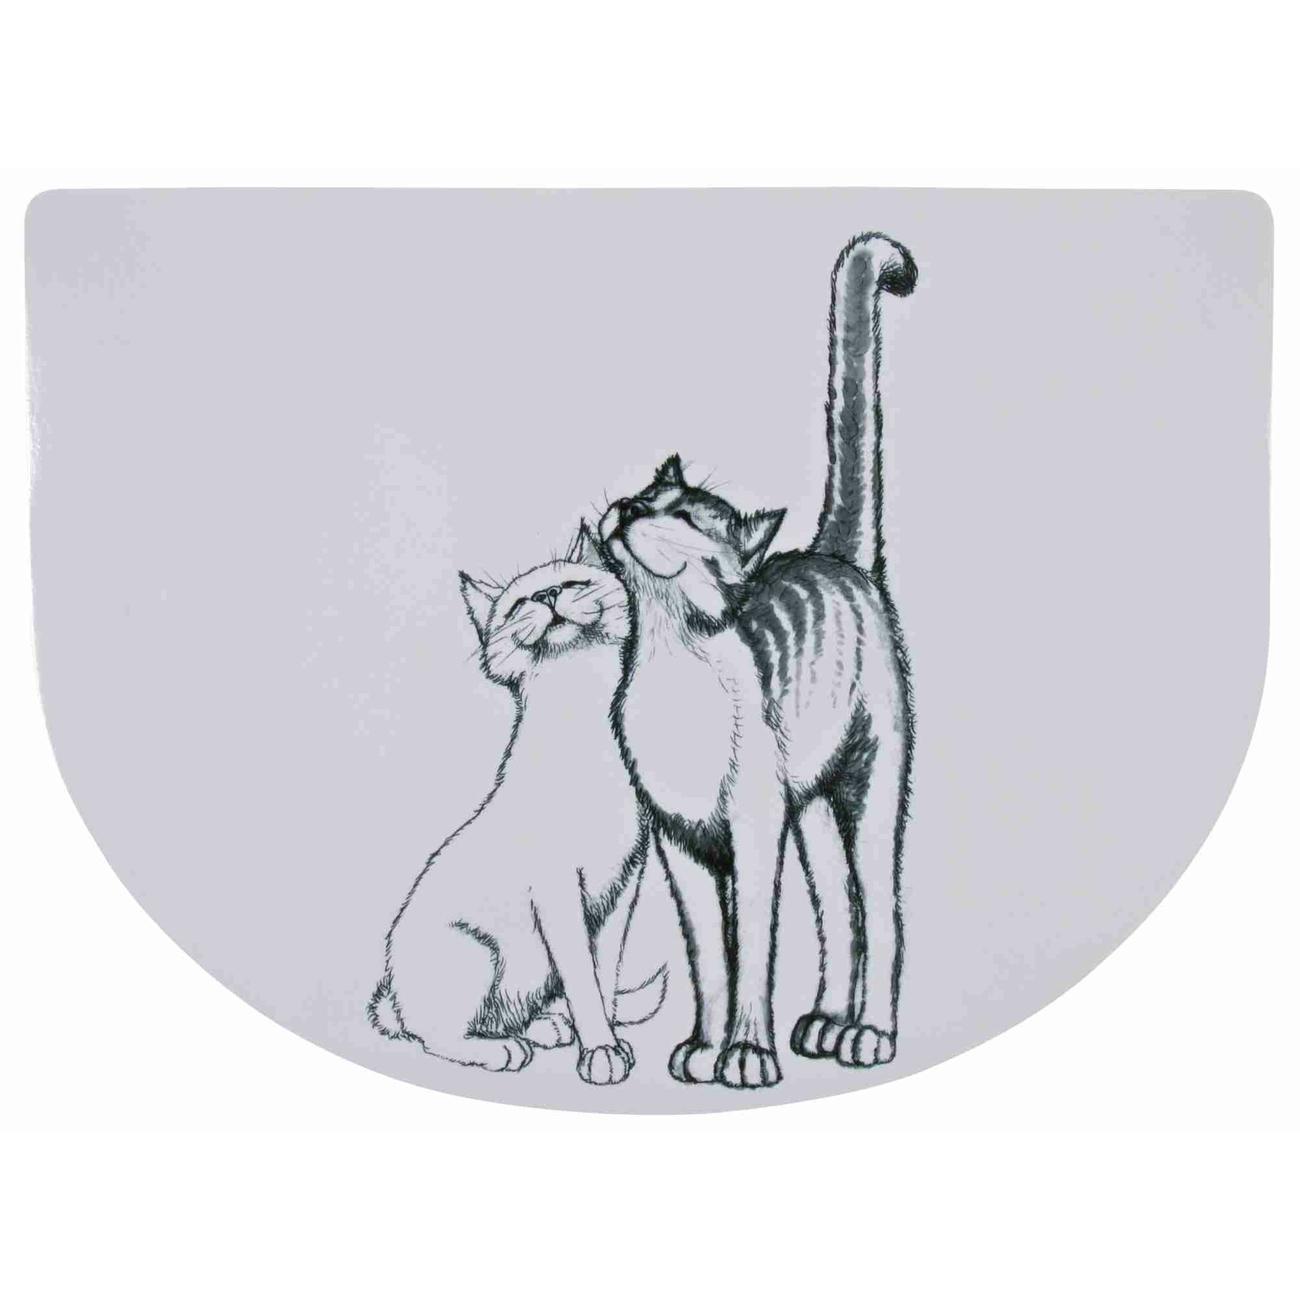 TRIXIE Napfunterlage Katze Schmusekatzen 24540